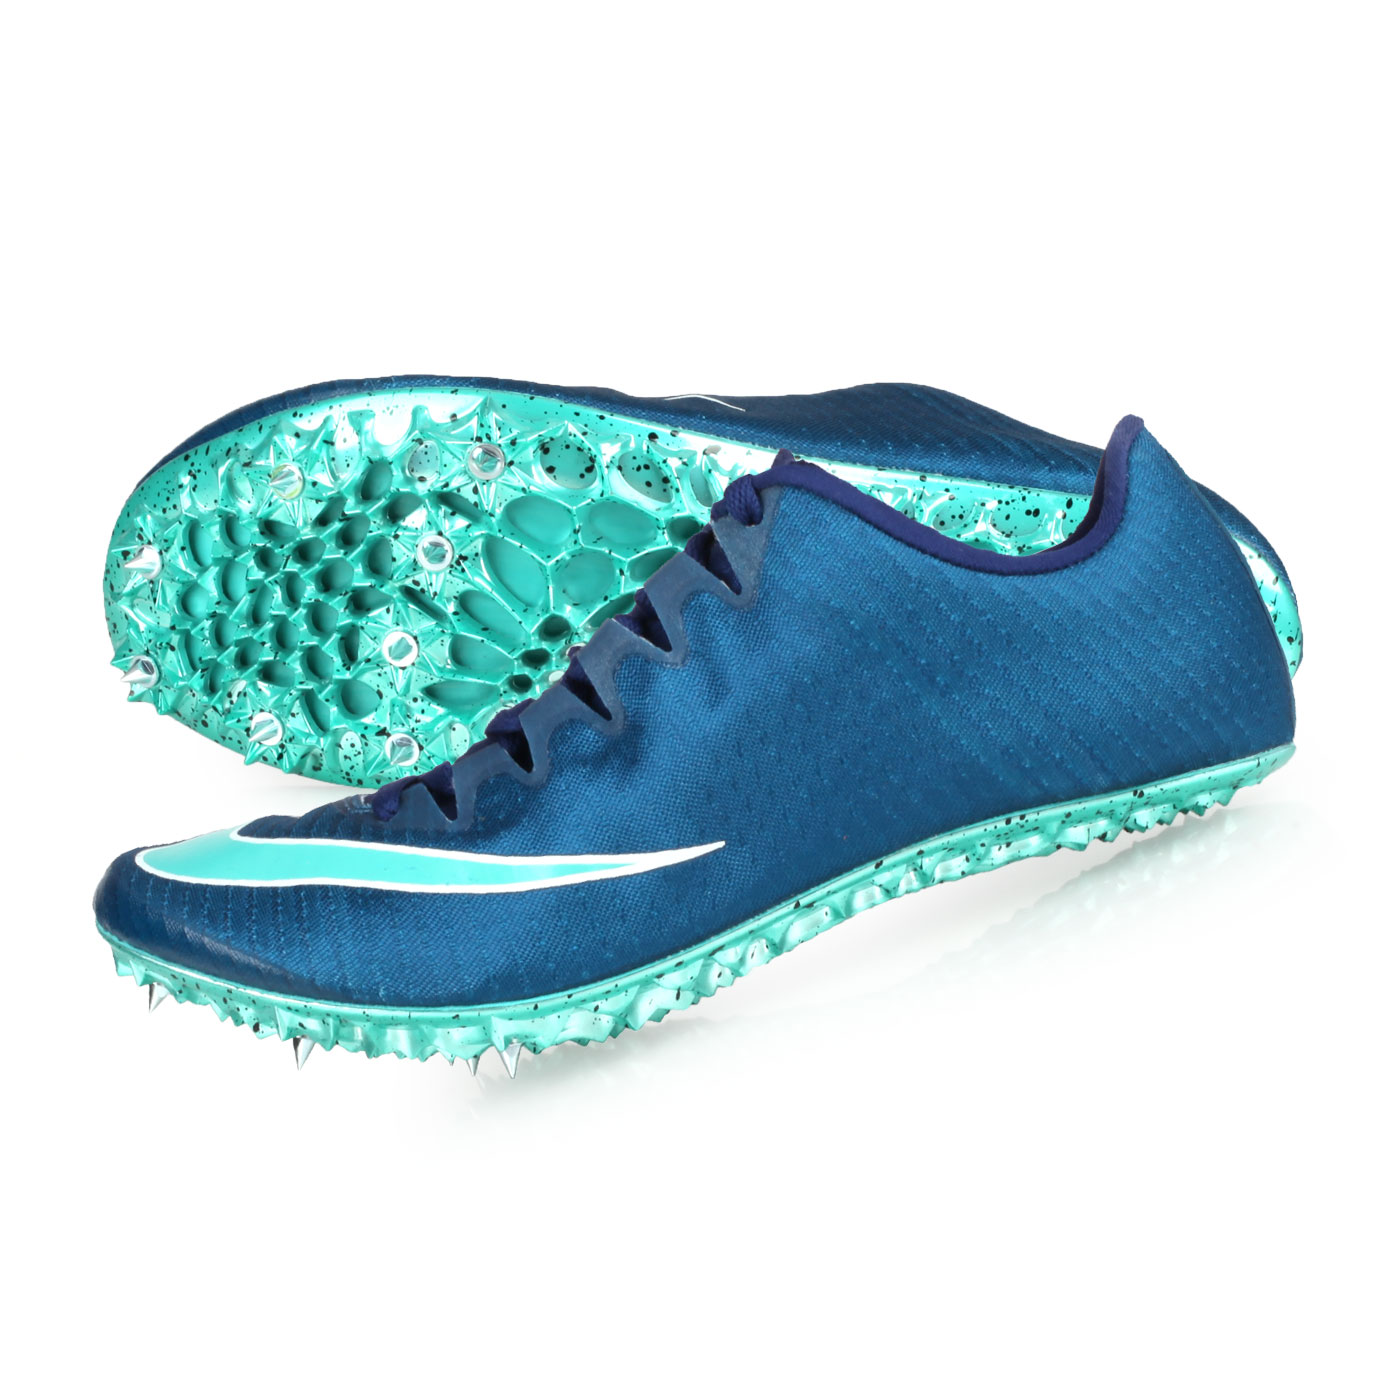 NIKE 田徑釘鞋(短距離)  @ZOOM SUPERFLY ELITE@835996001 - 墨藍湖水綠